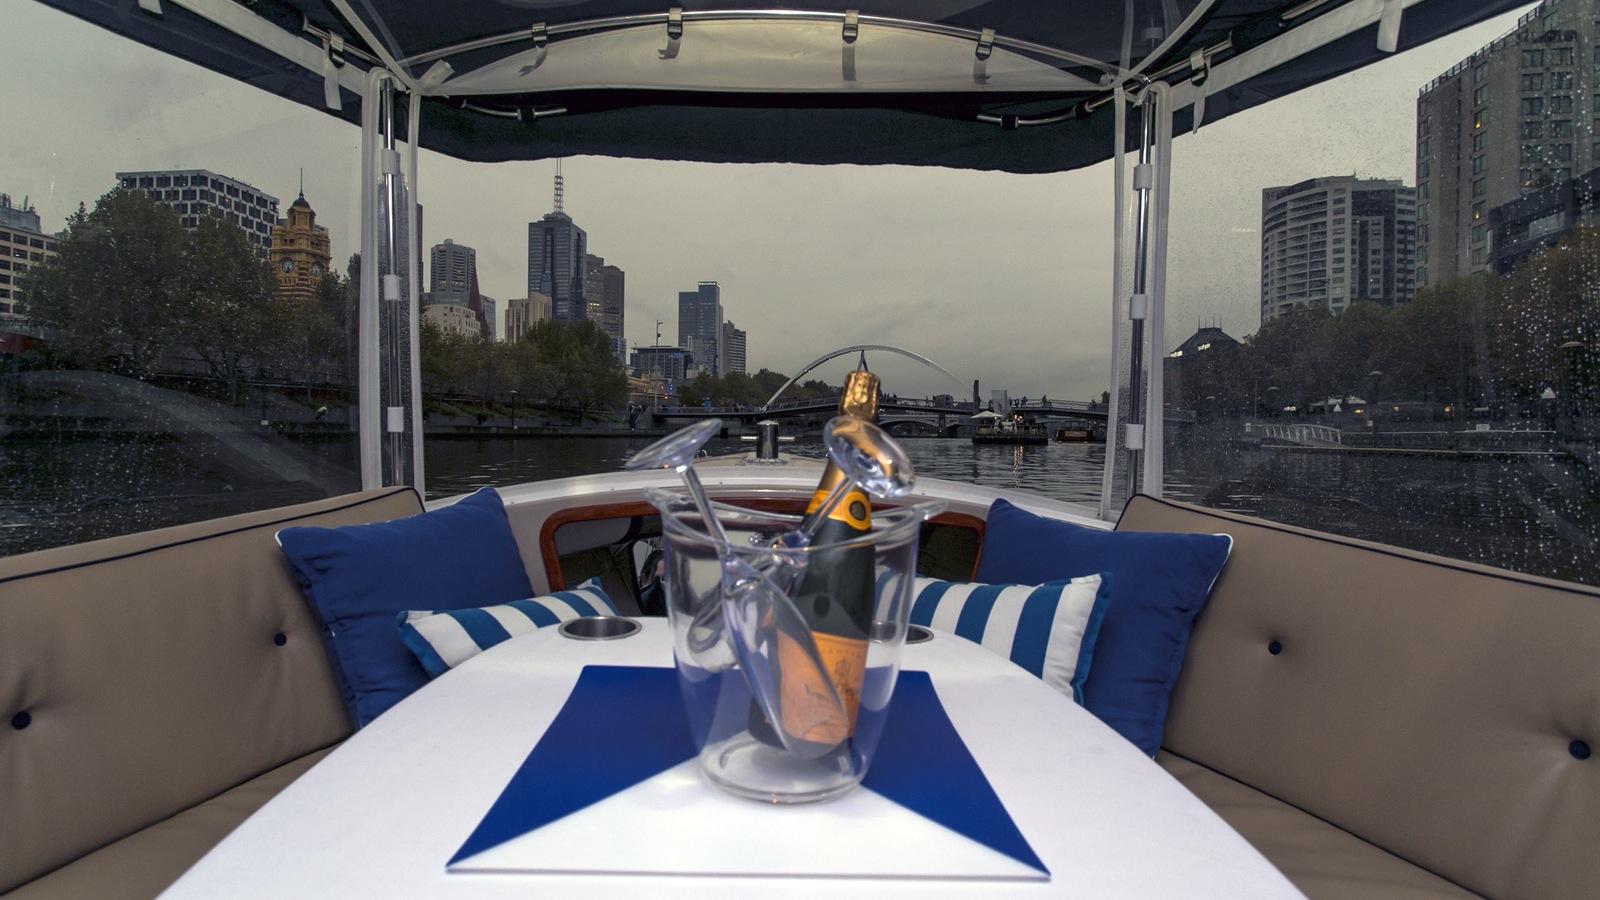 Melbourne Boat Hire Luxury Cruise